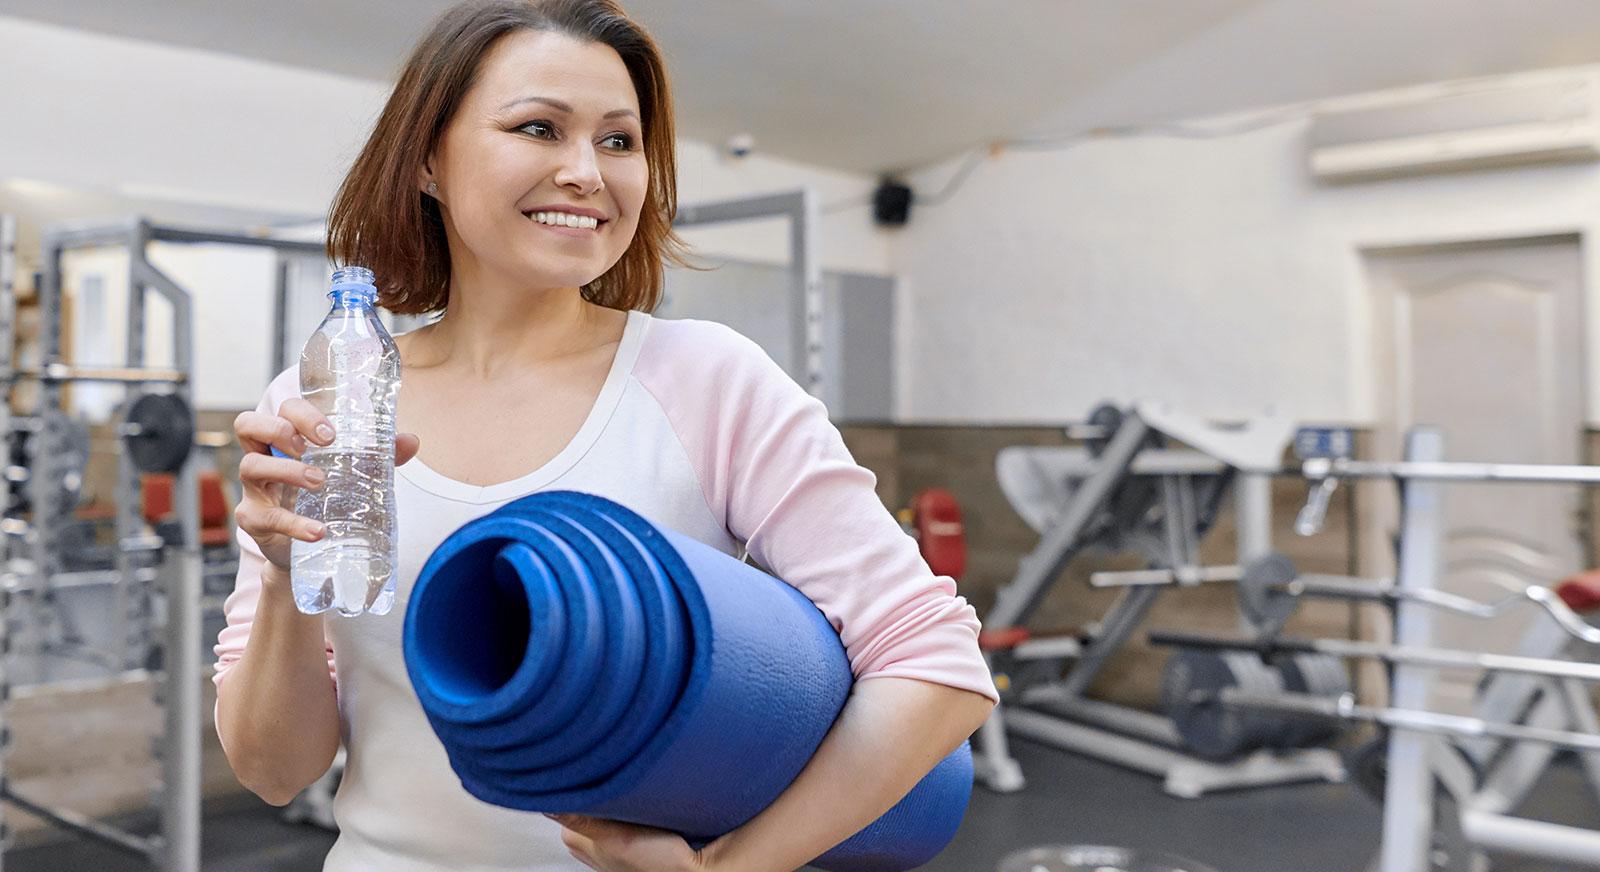 5 Fitness Over 40 Myths Debunked